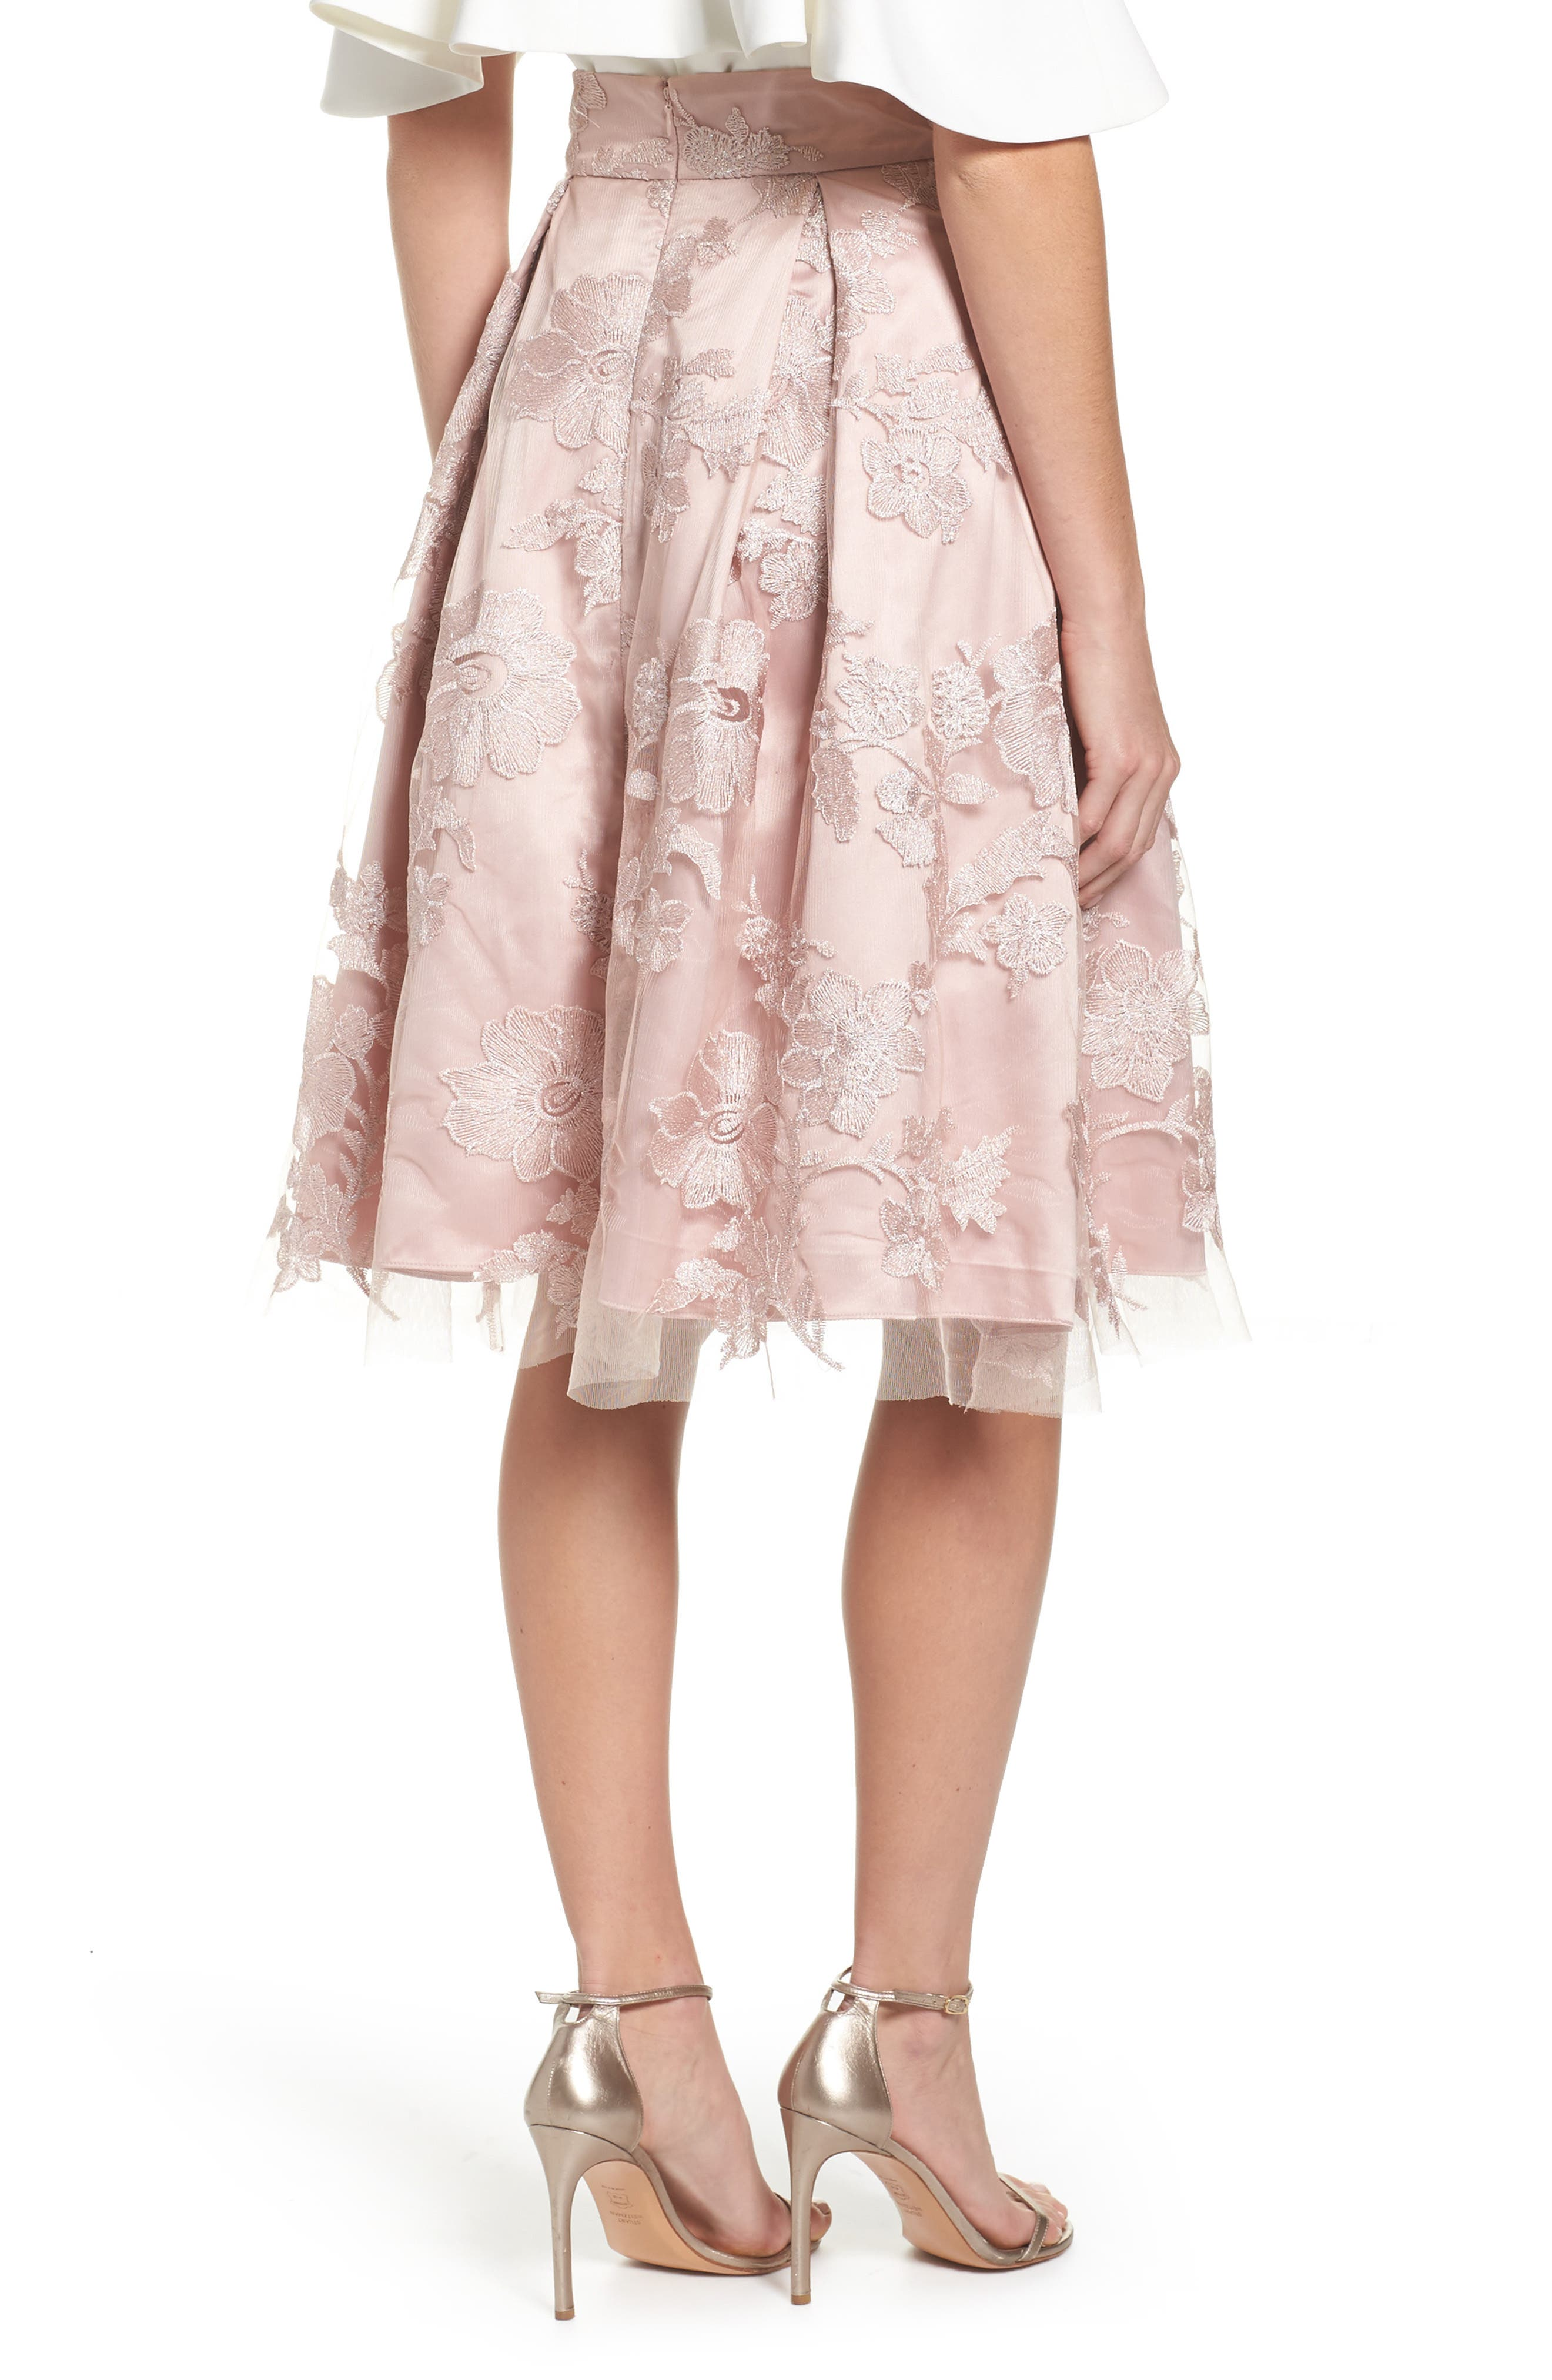 ELIZA J, Floral Embroidered Skirt, Alternate thumbnail 2, color, 254